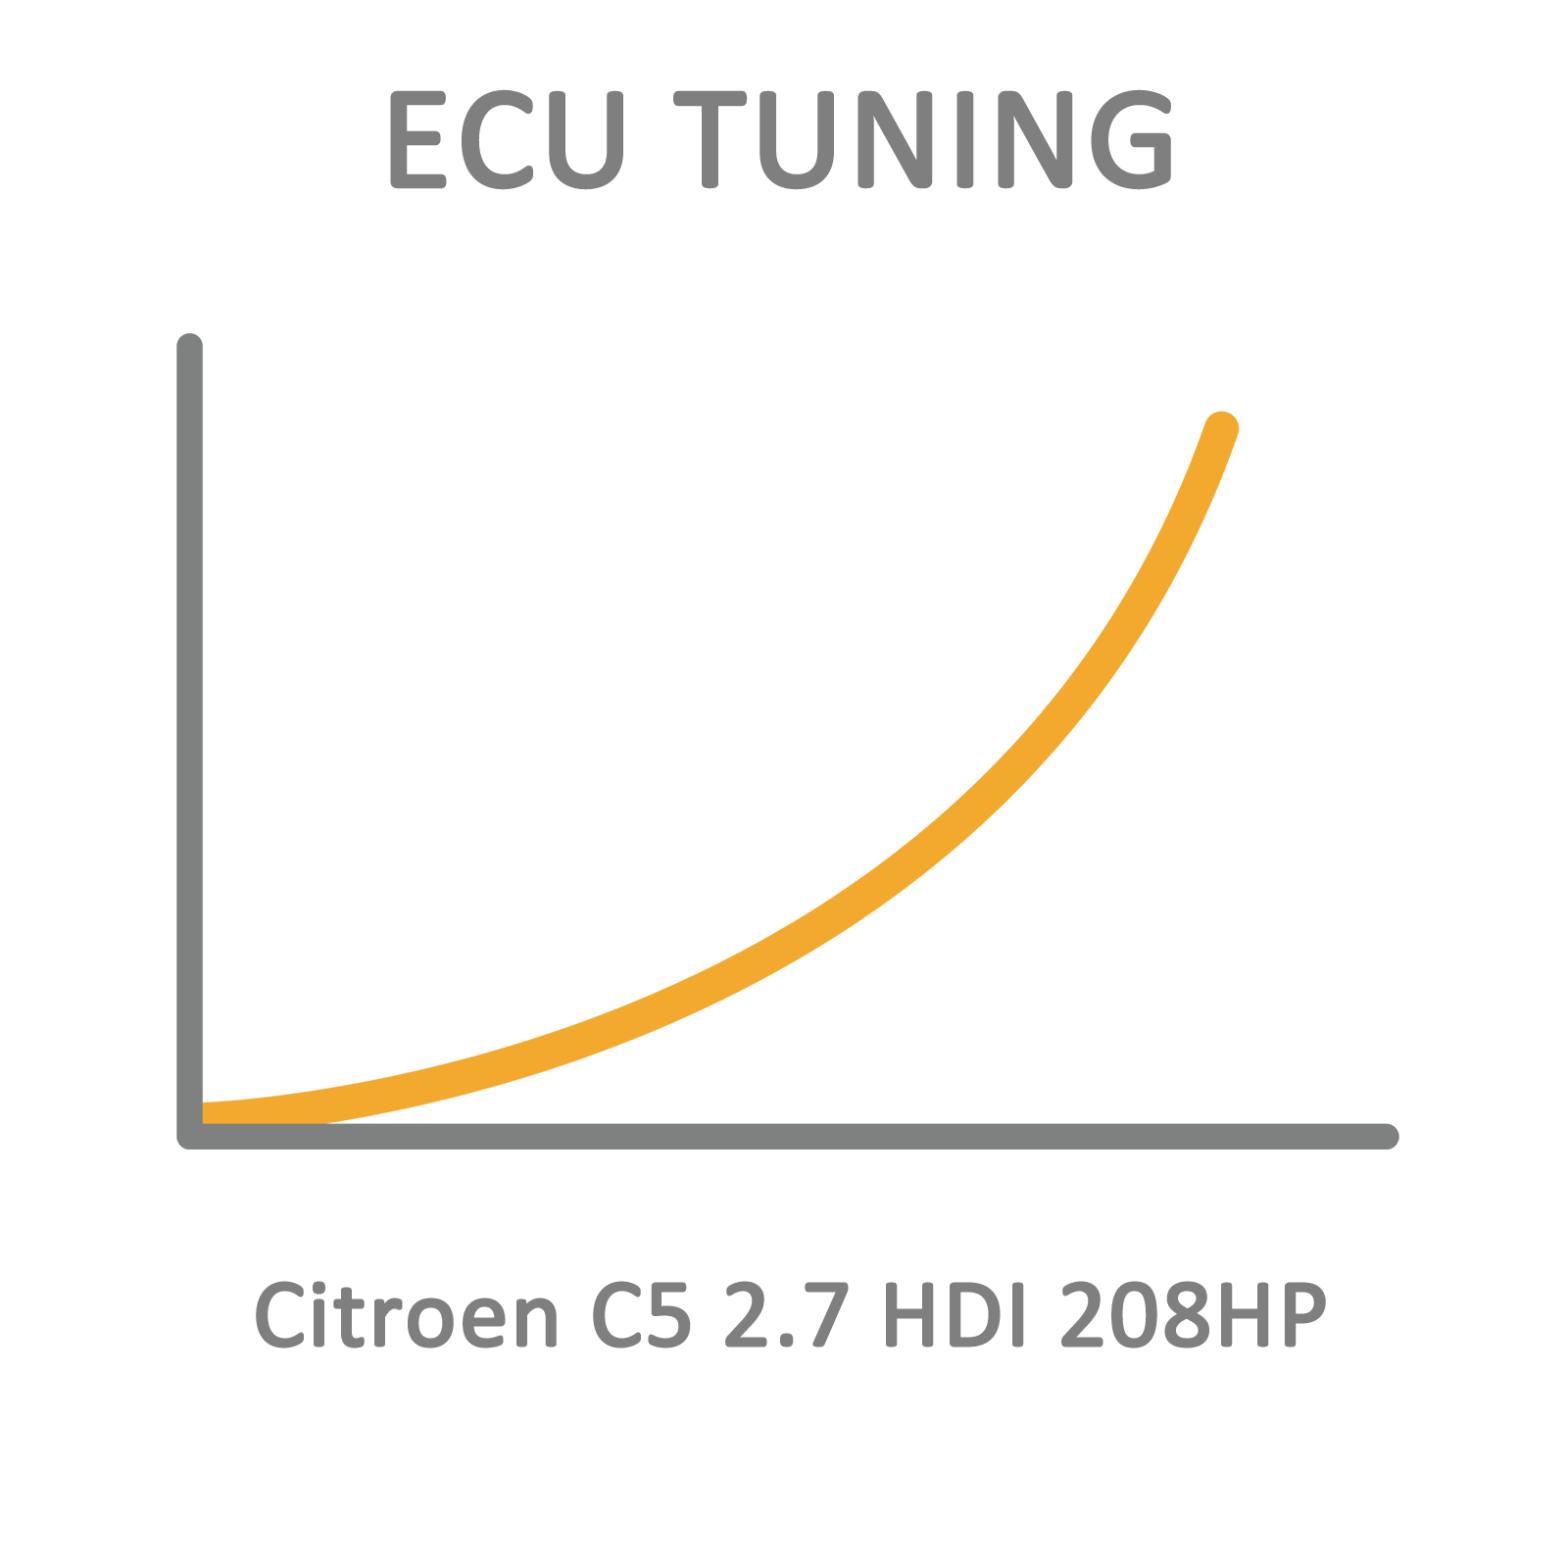 Citroen C5 2.7 HDI 208HP ECU Tuning Remapping Programming